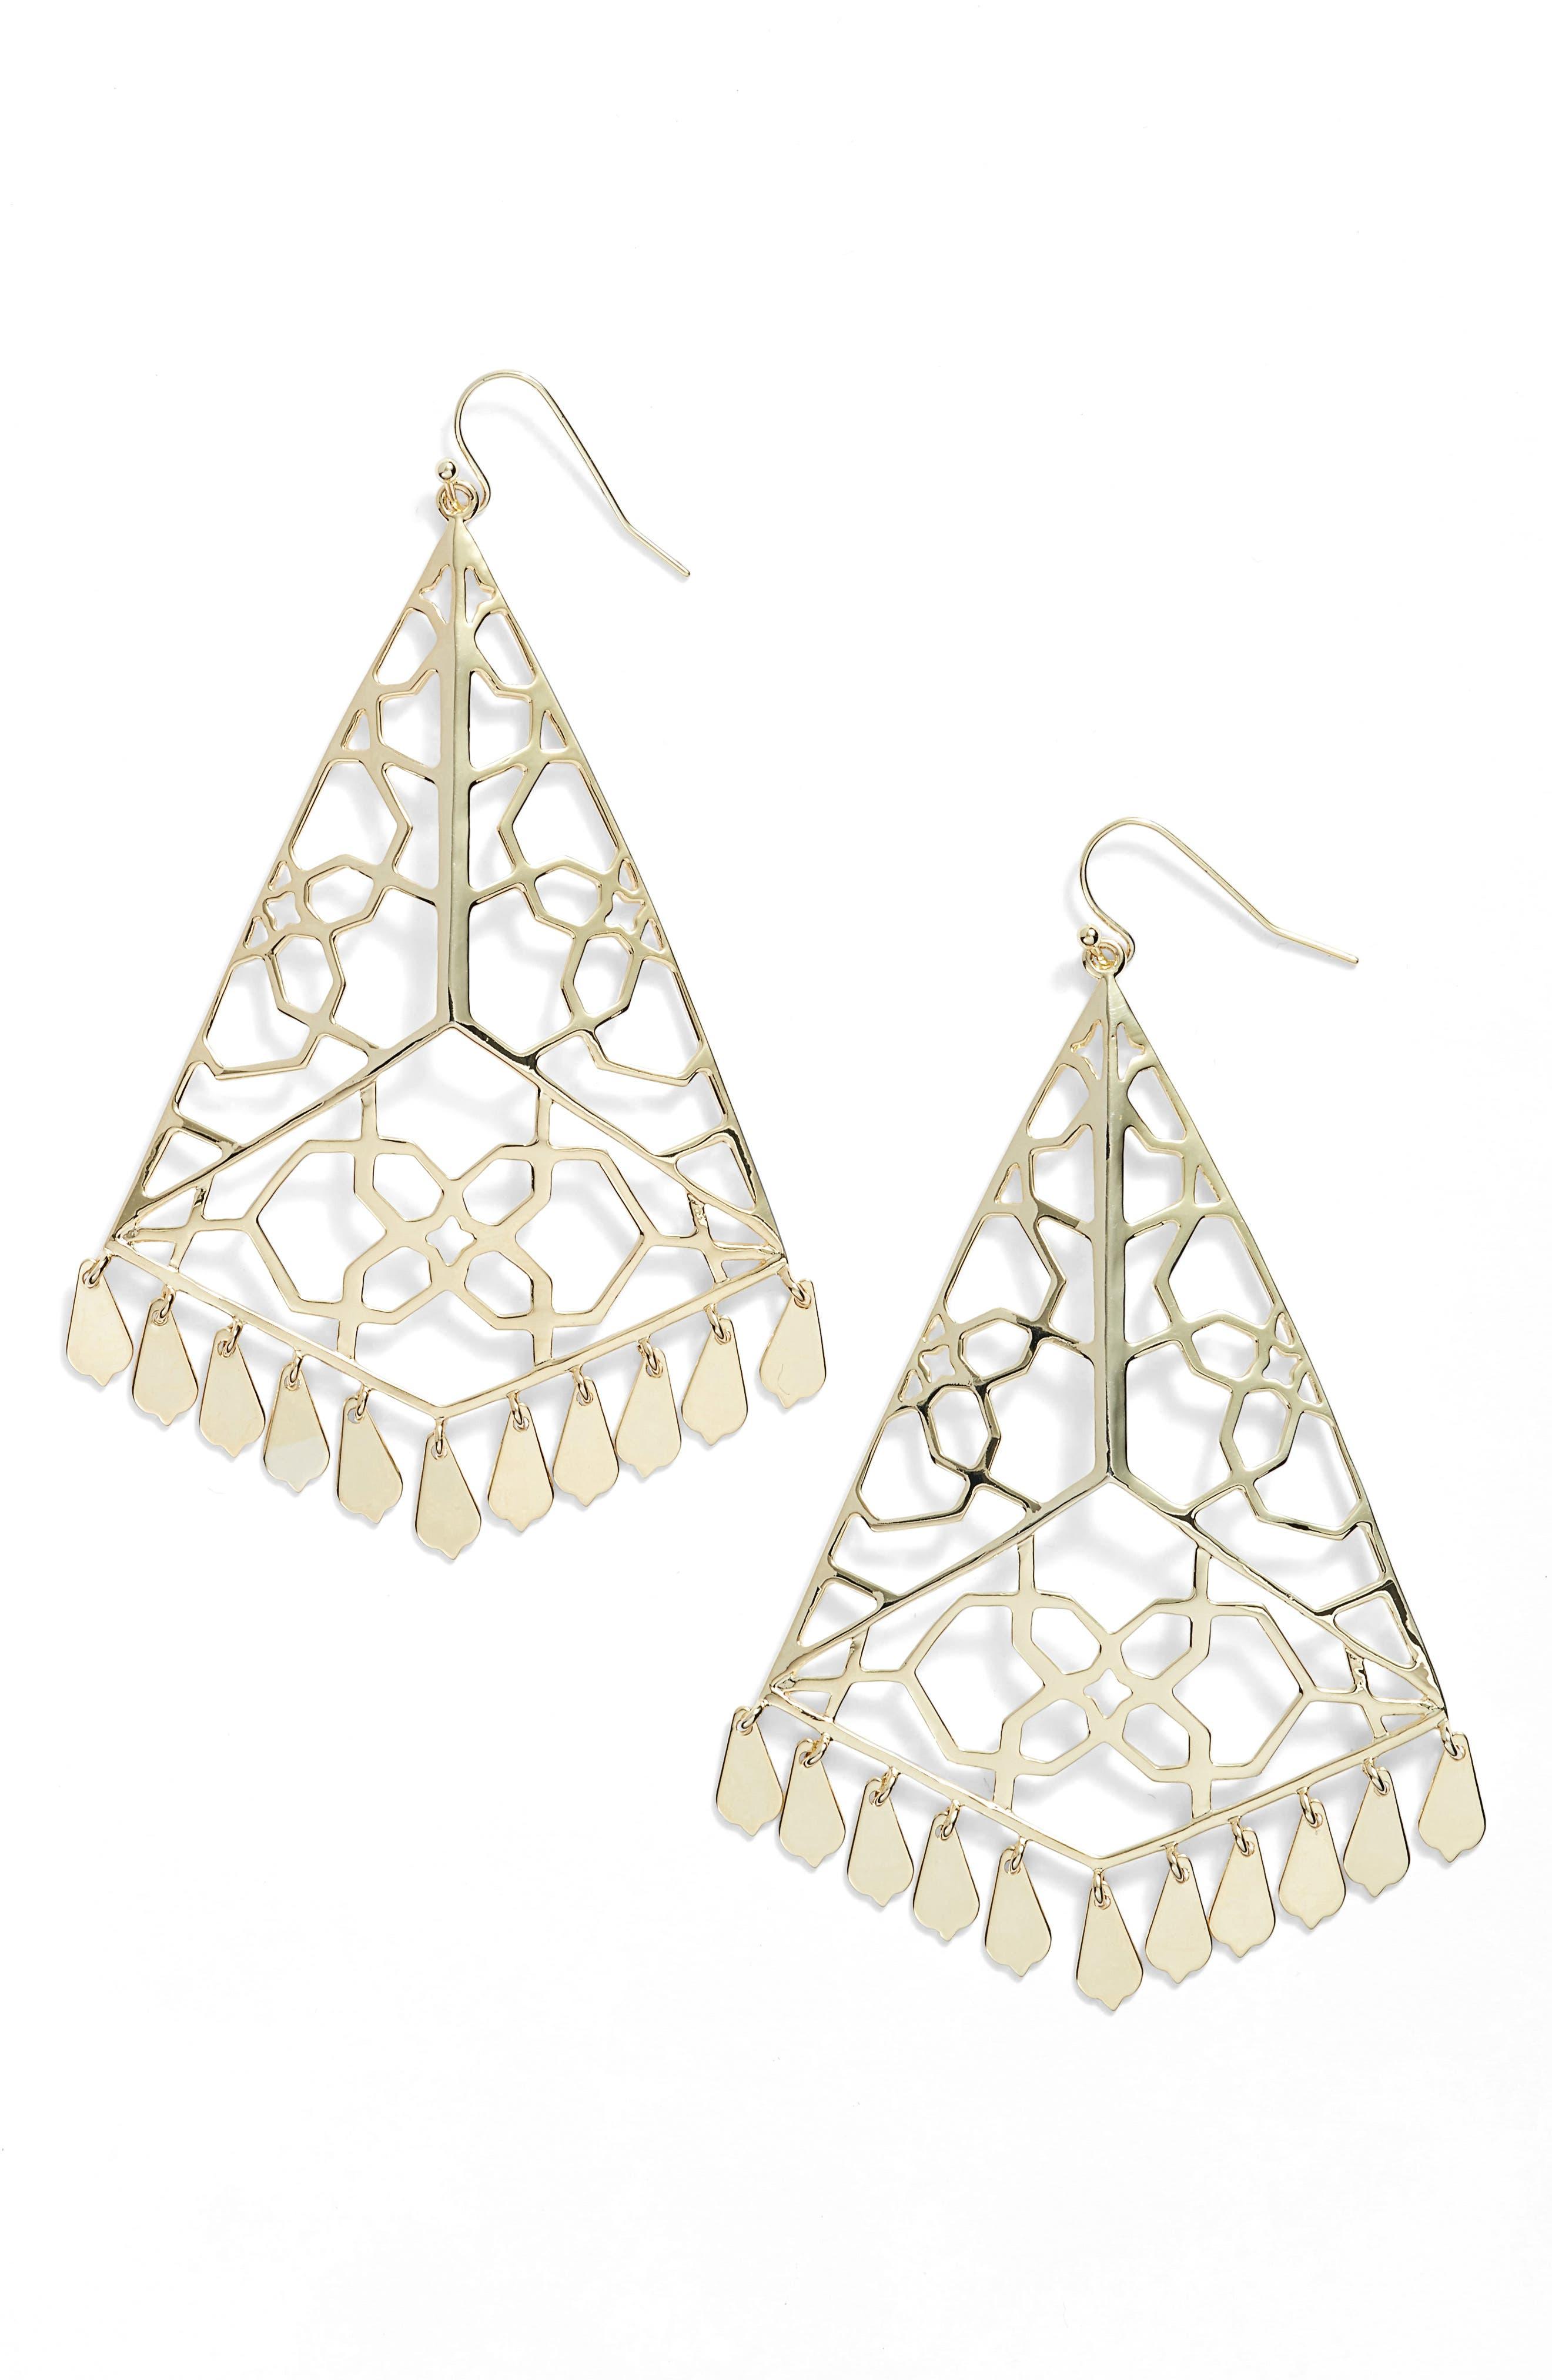 Kendra Scott Samira Drop Earrings